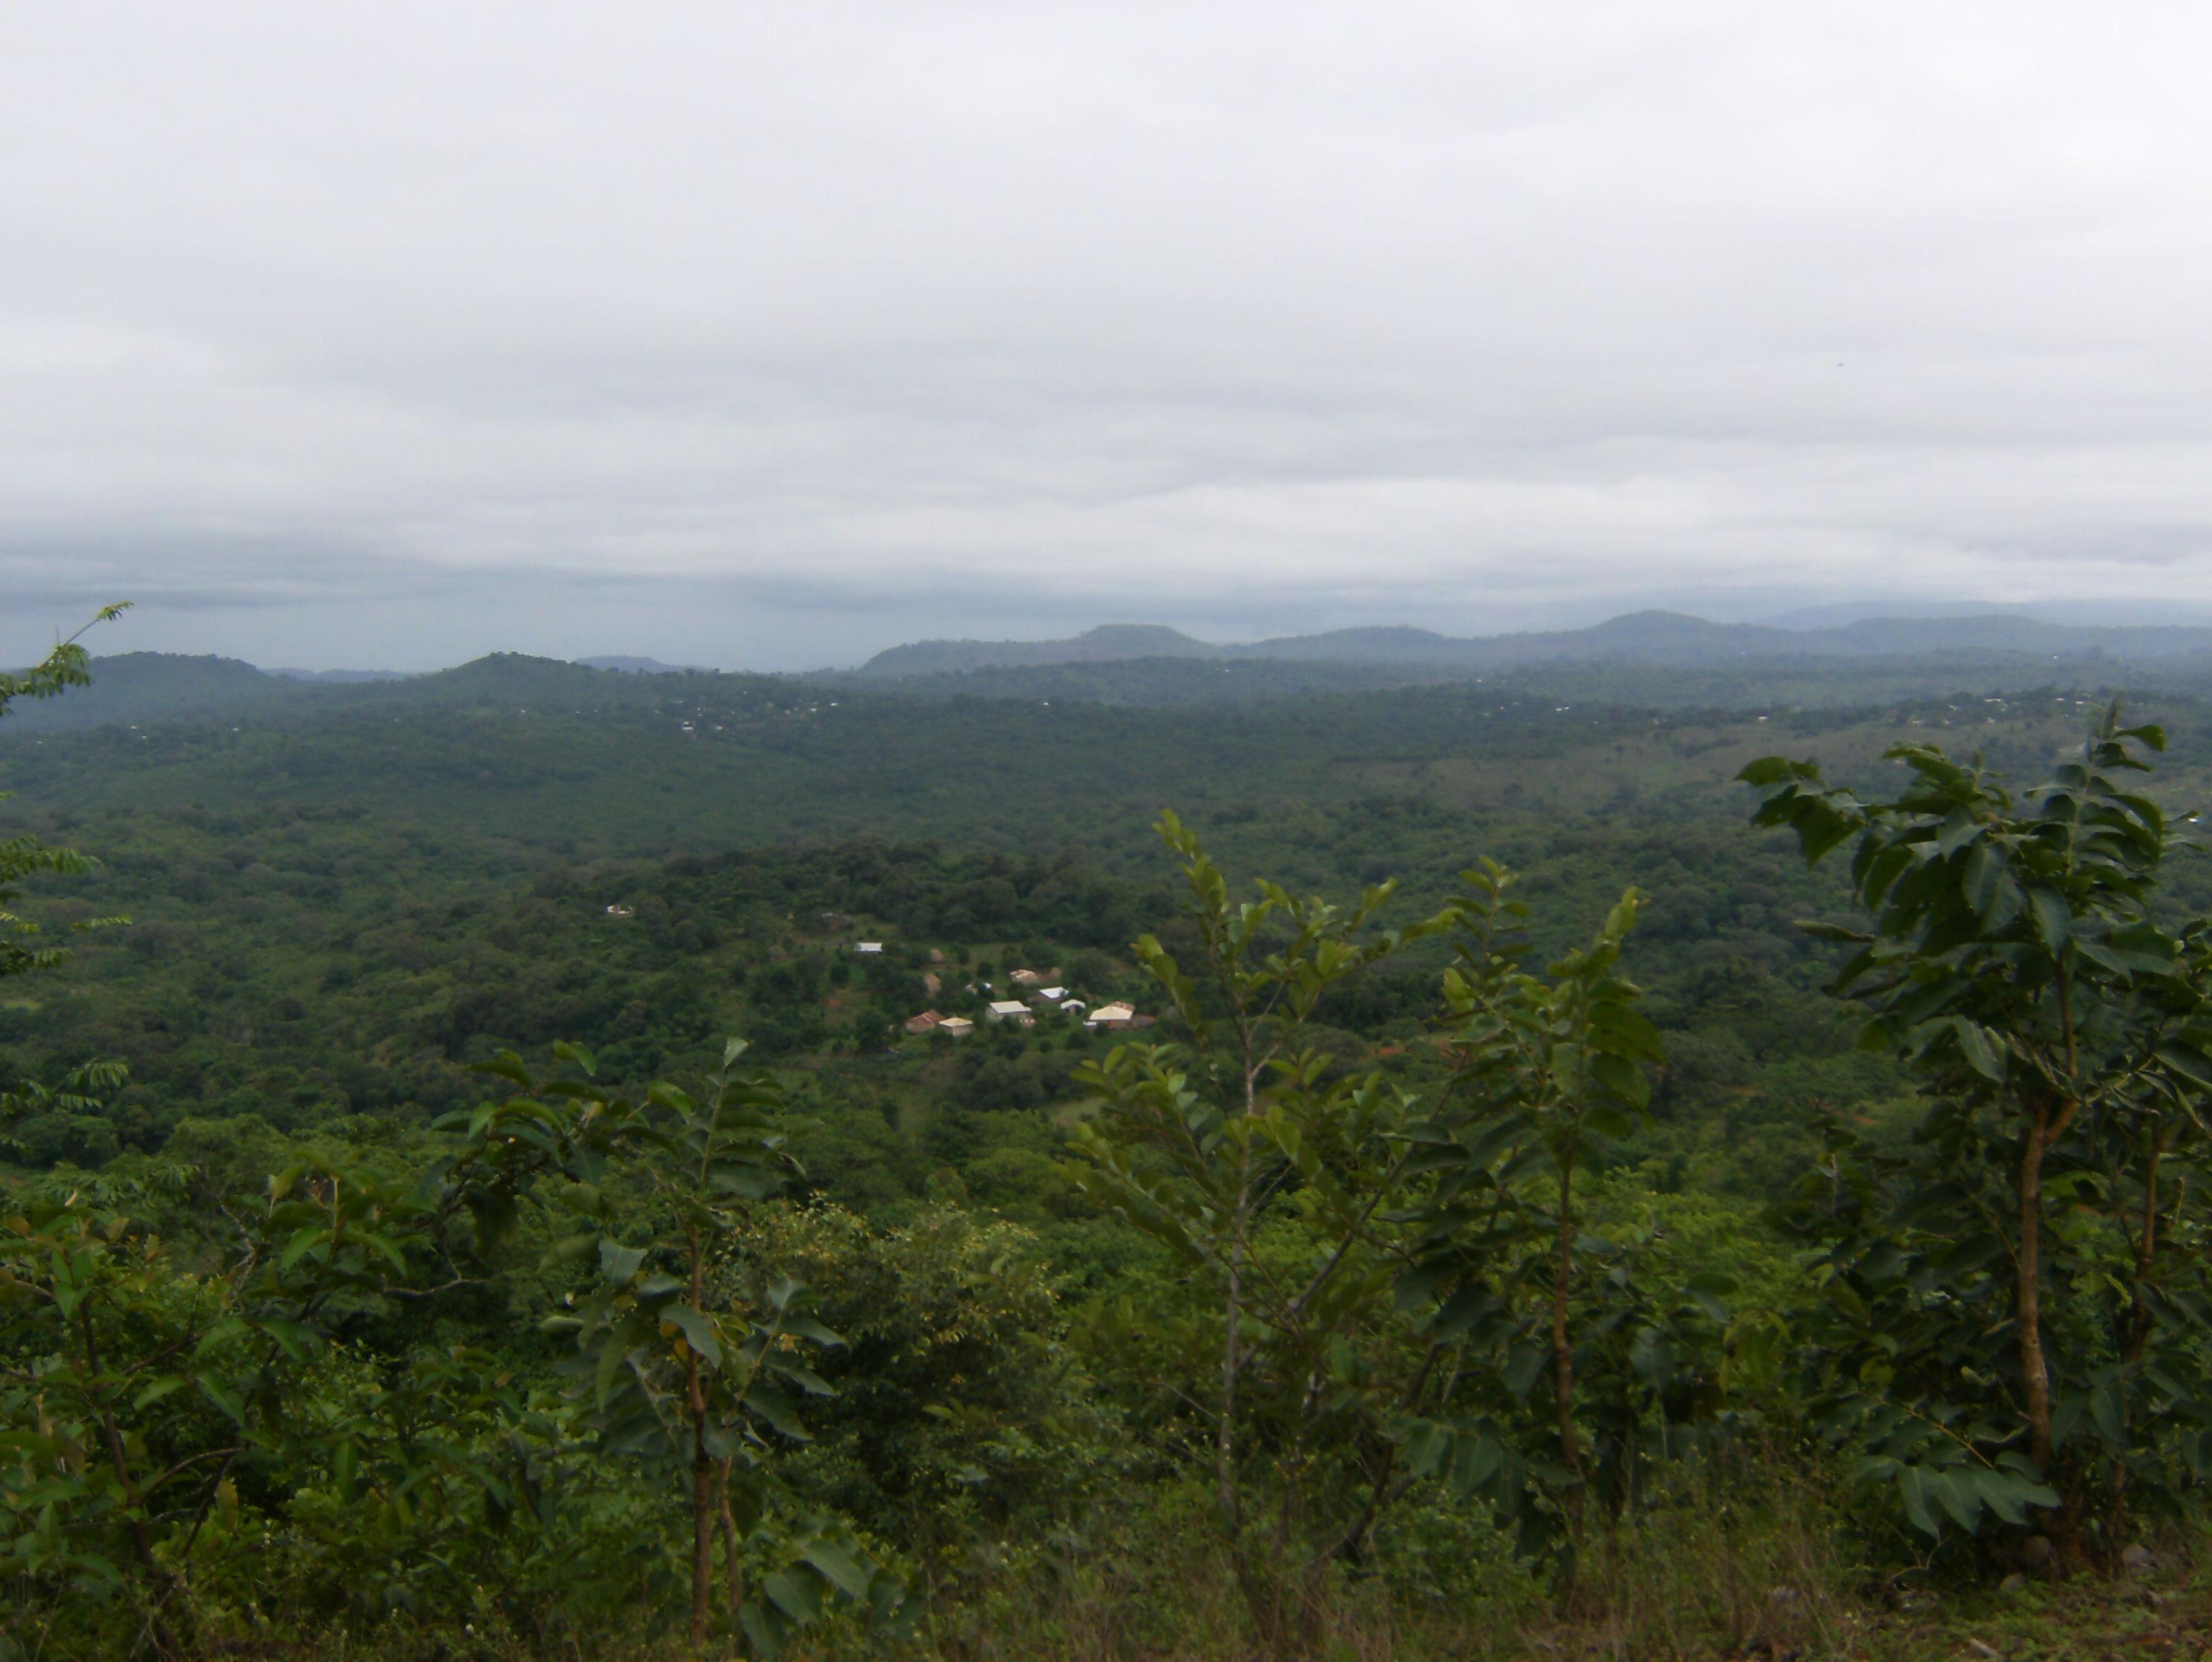 Paysage du Fouta, région de Pita